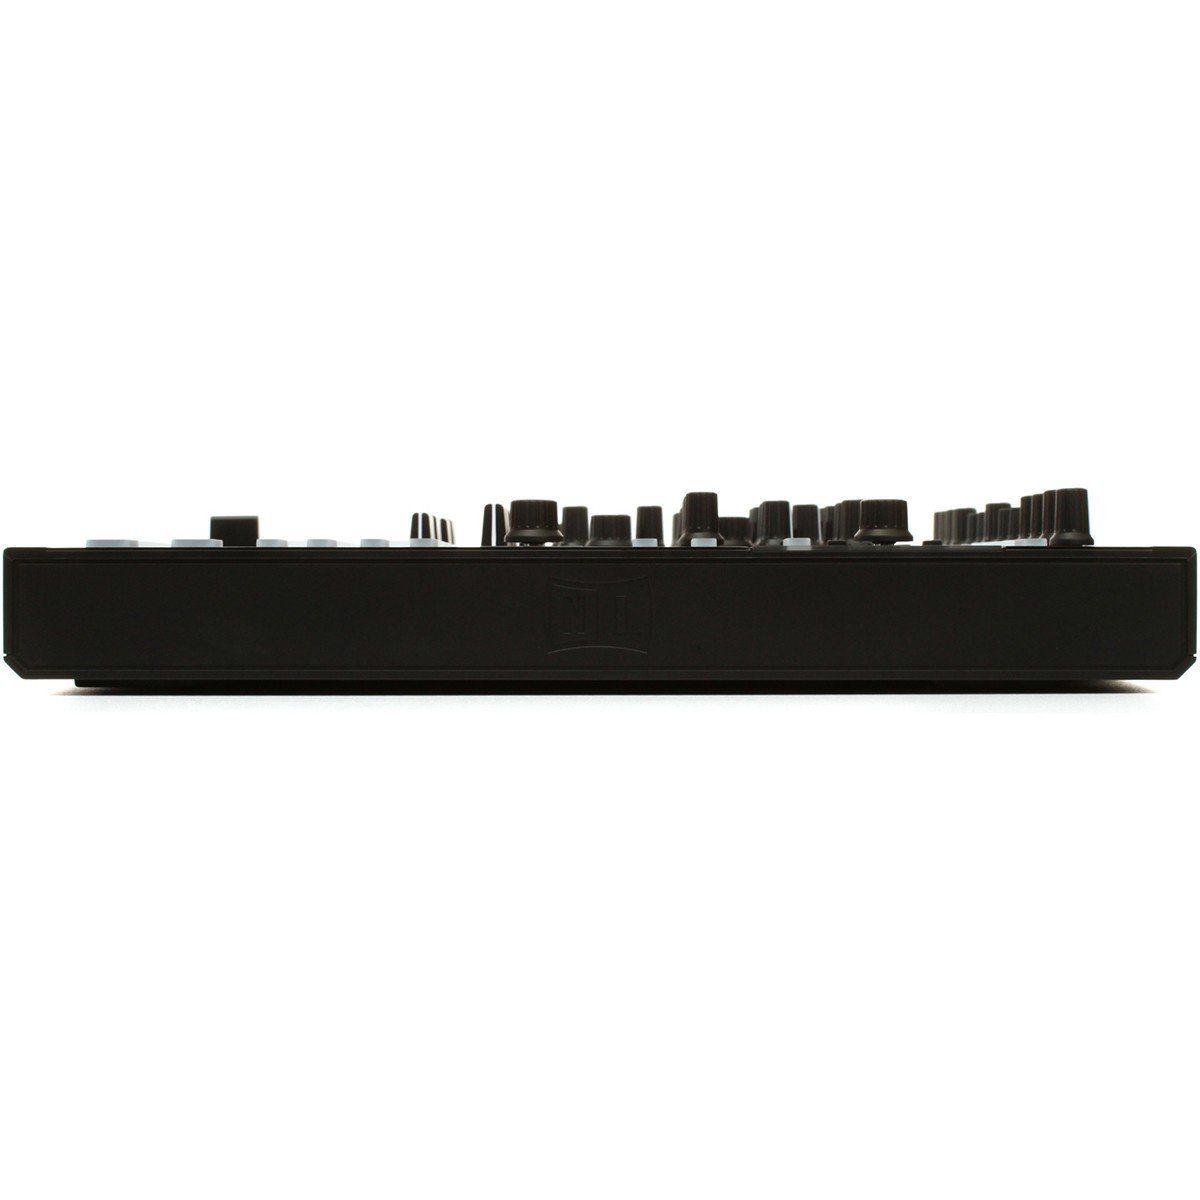 Native Instruments Traktor Kontrol S8 Controladora Dj 4-Decks 4-Canais Display